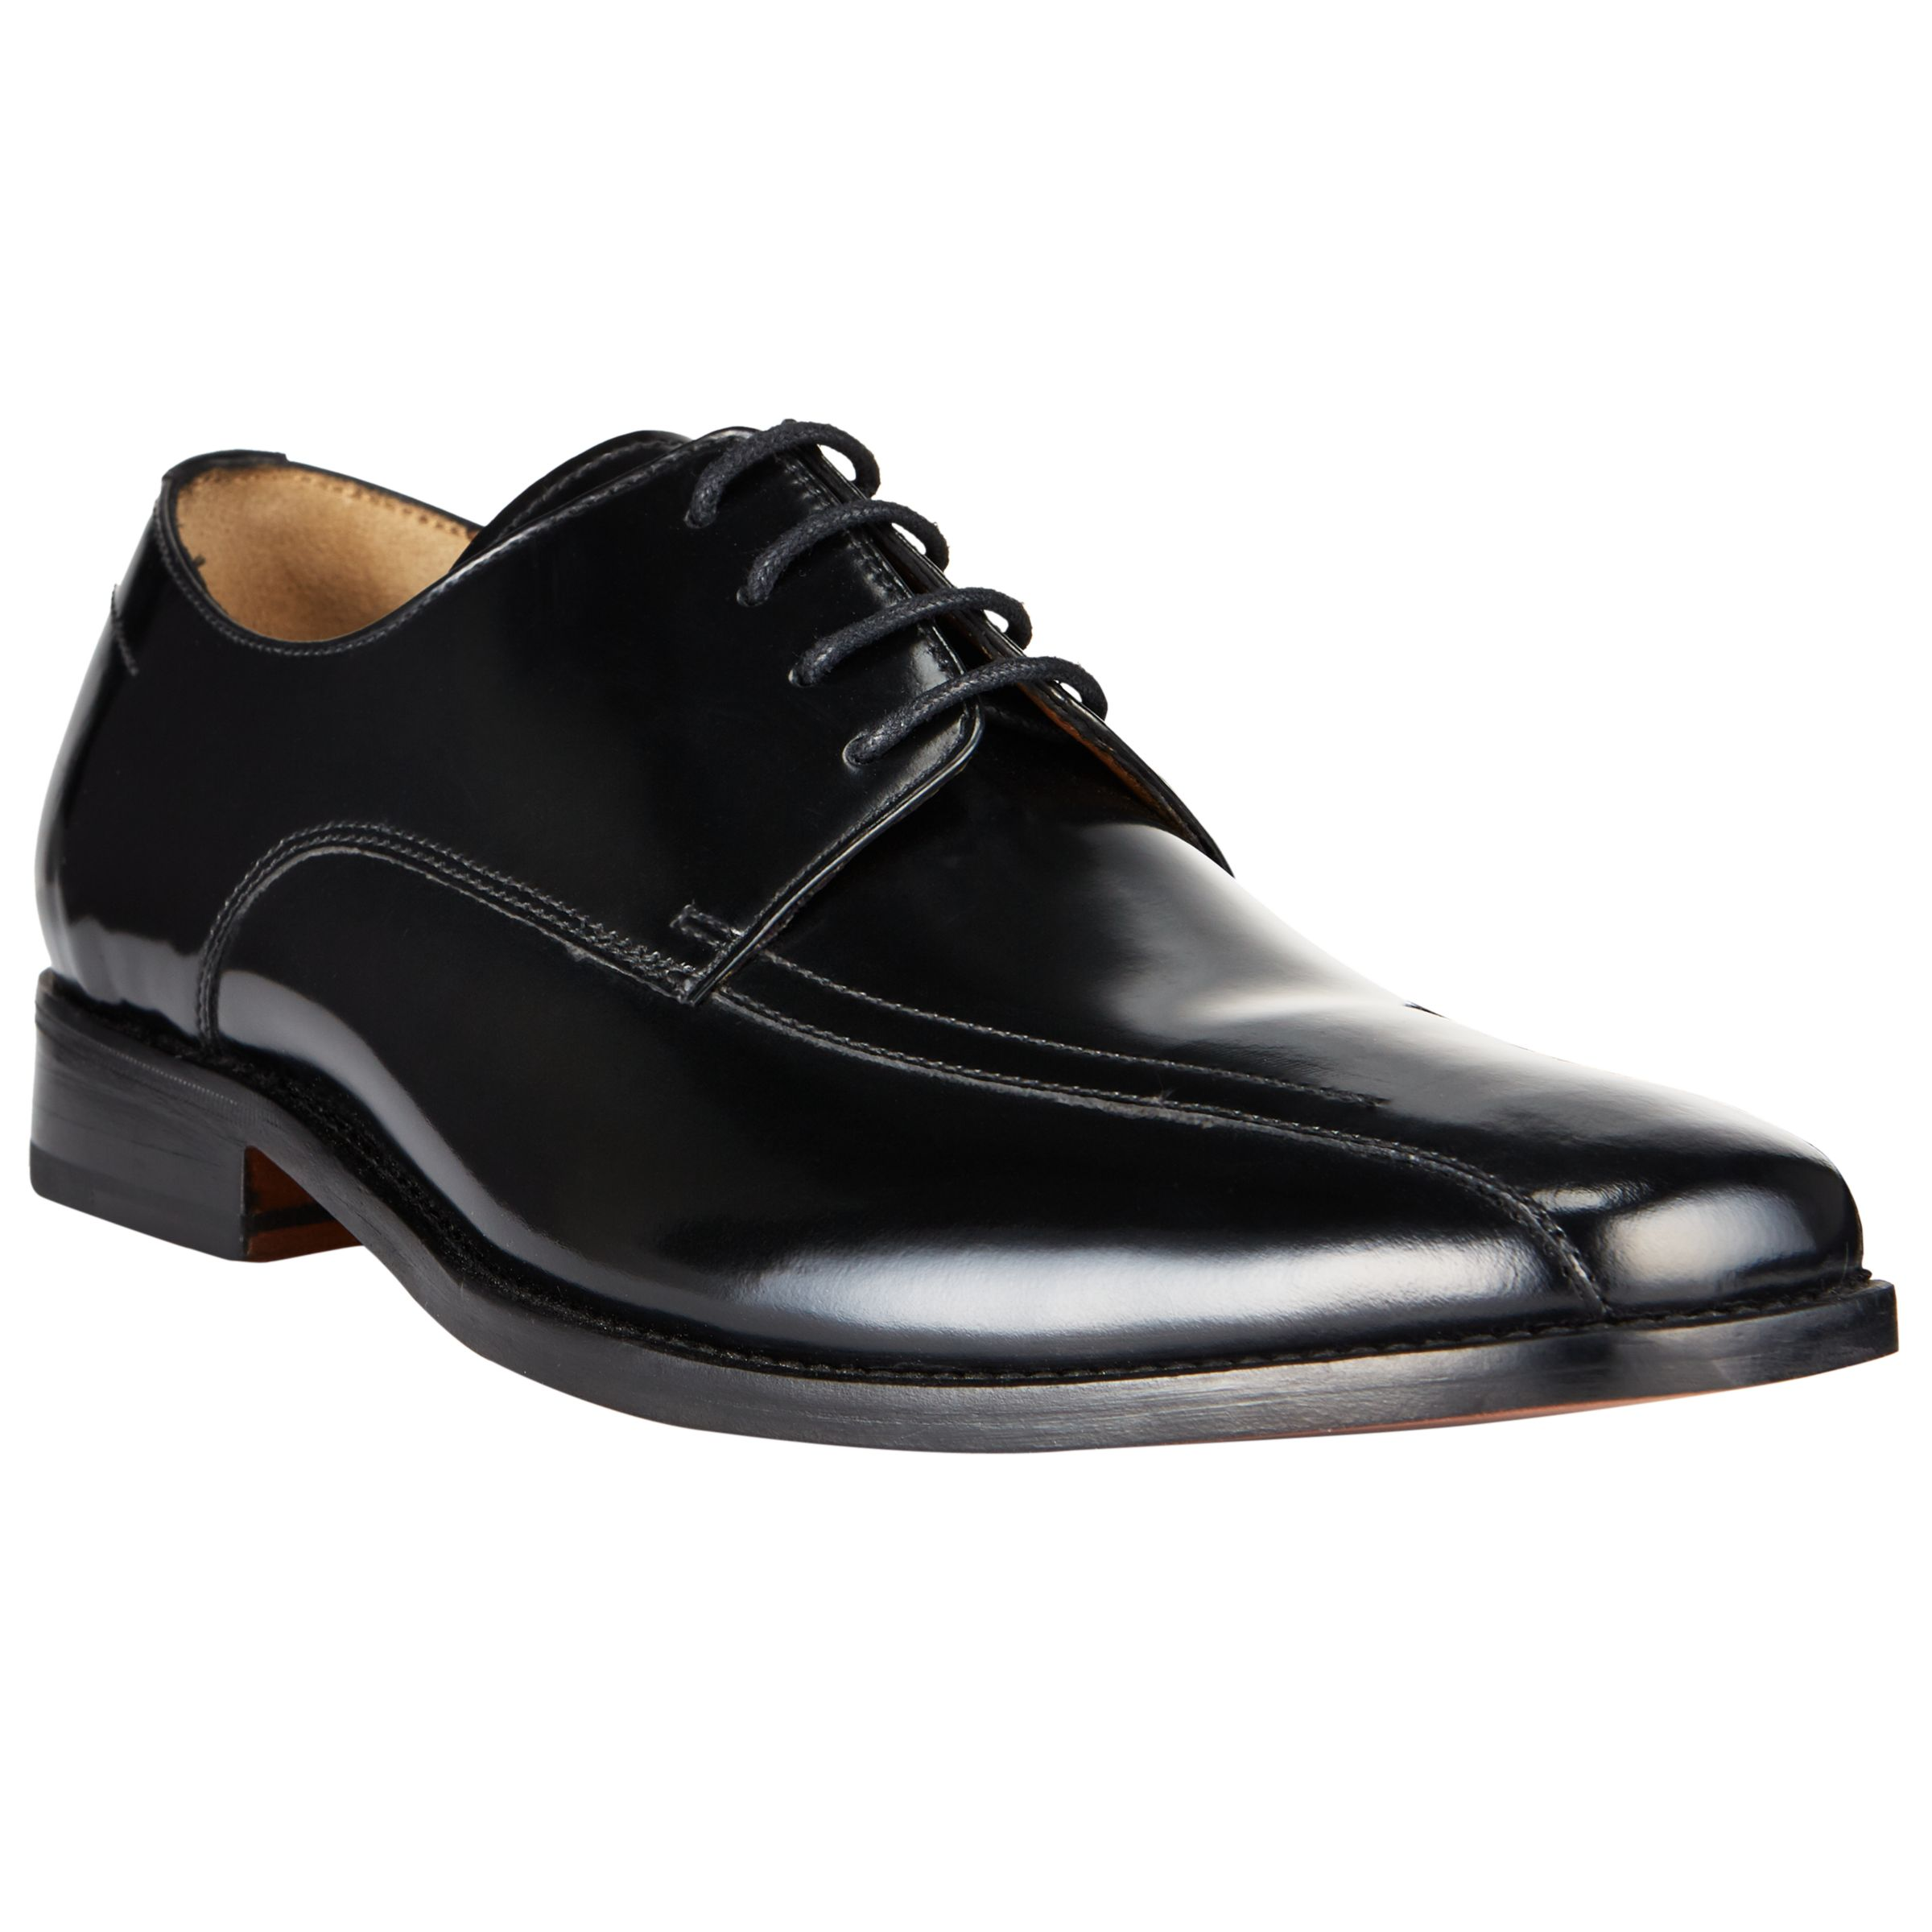 0eea0edf0e49 John Lewis Albert Tramline Leather Derby Shoes, Black at John Lewis &  Partners